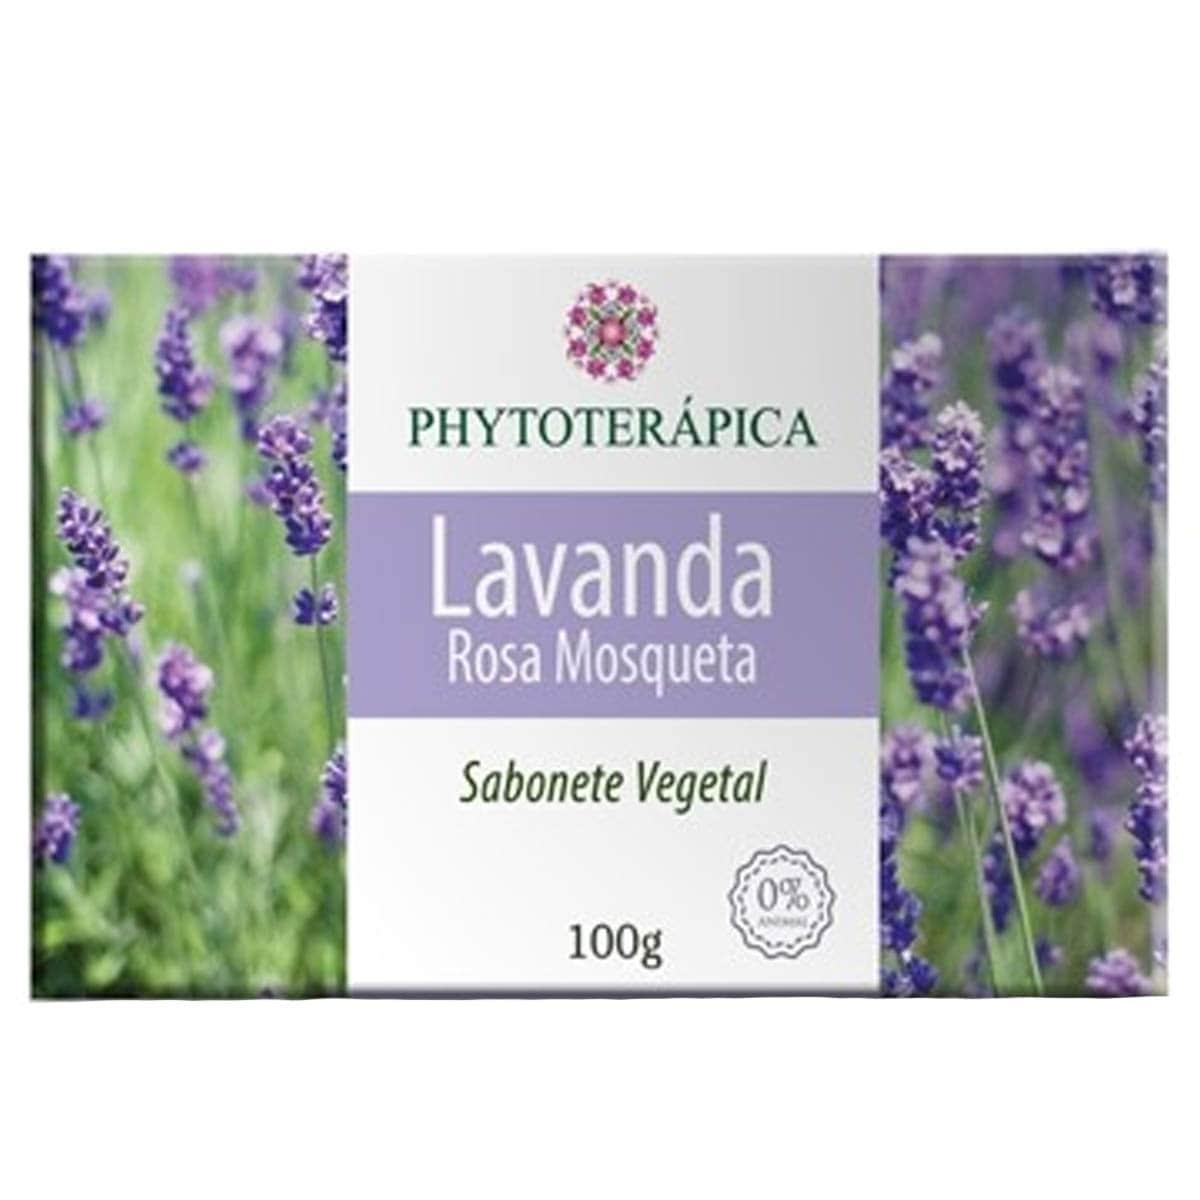 Sabonete Lavanda E Rosa Mosqueta 100g - Phytoterapica